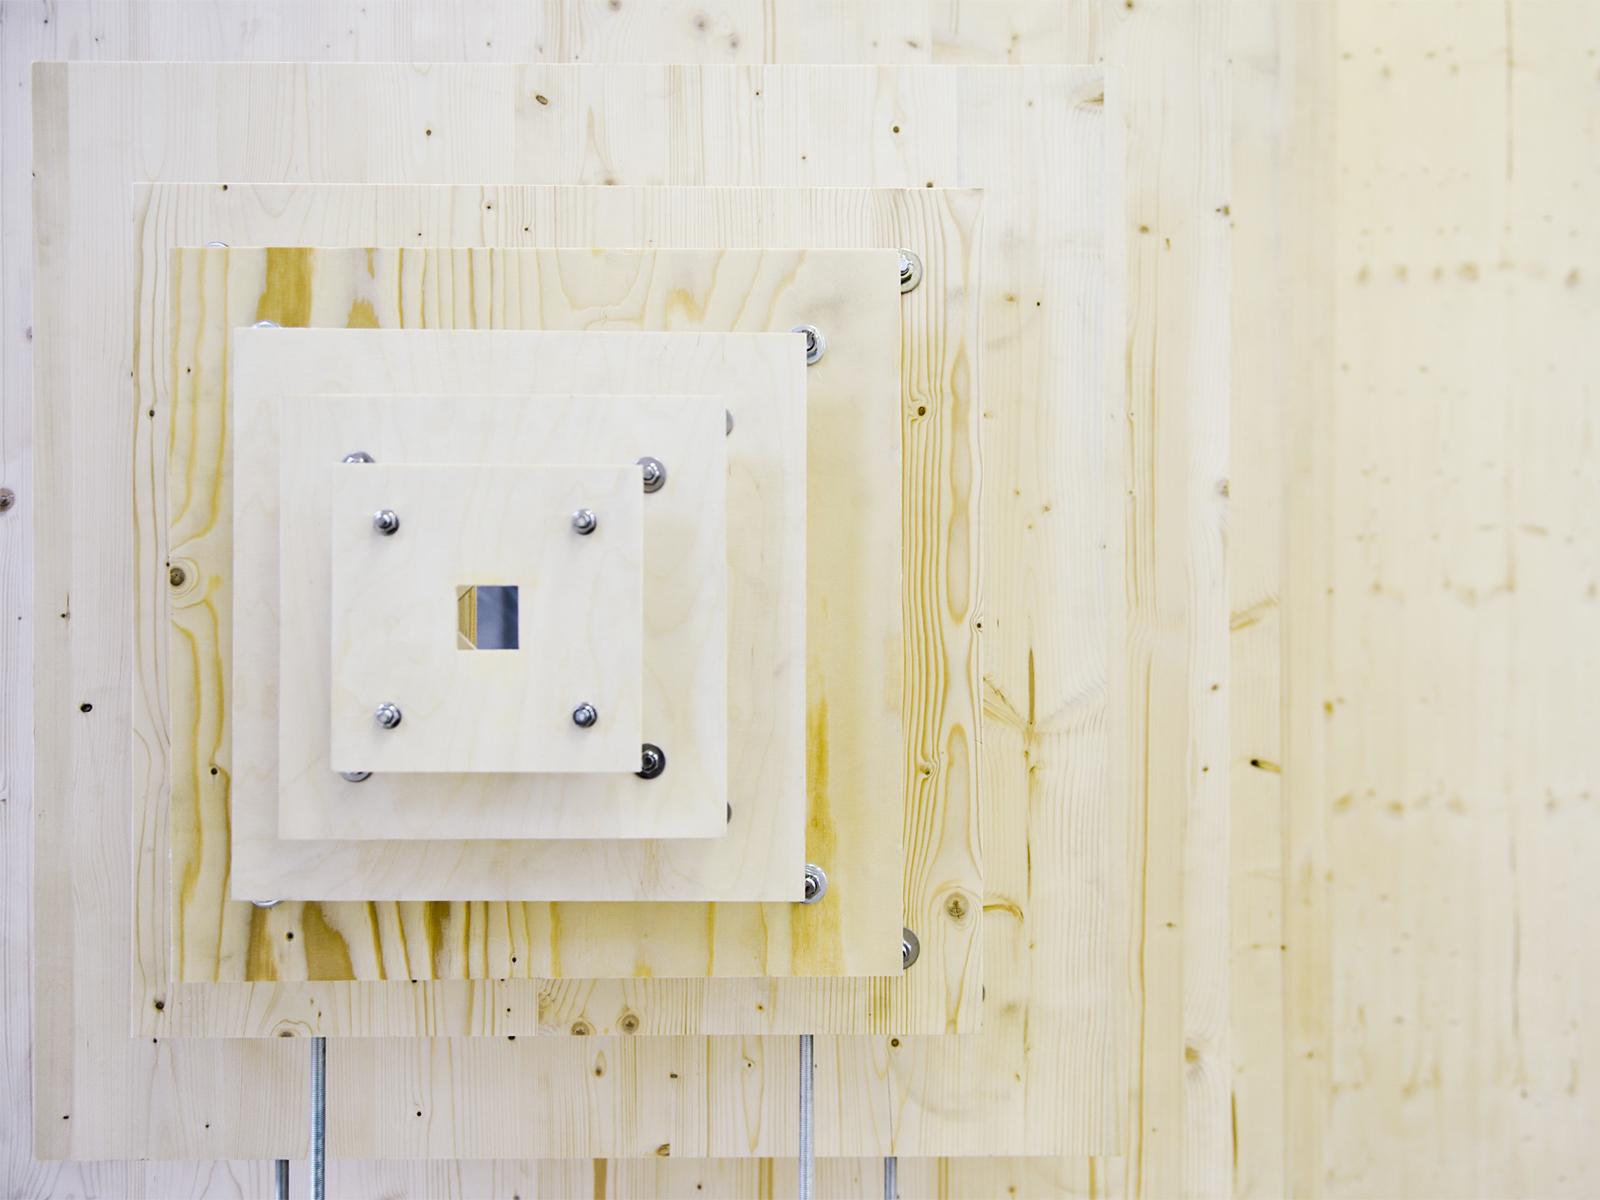 Benoit-Delaunay-artiste-installations-Un Sentiment de Chaleur-20